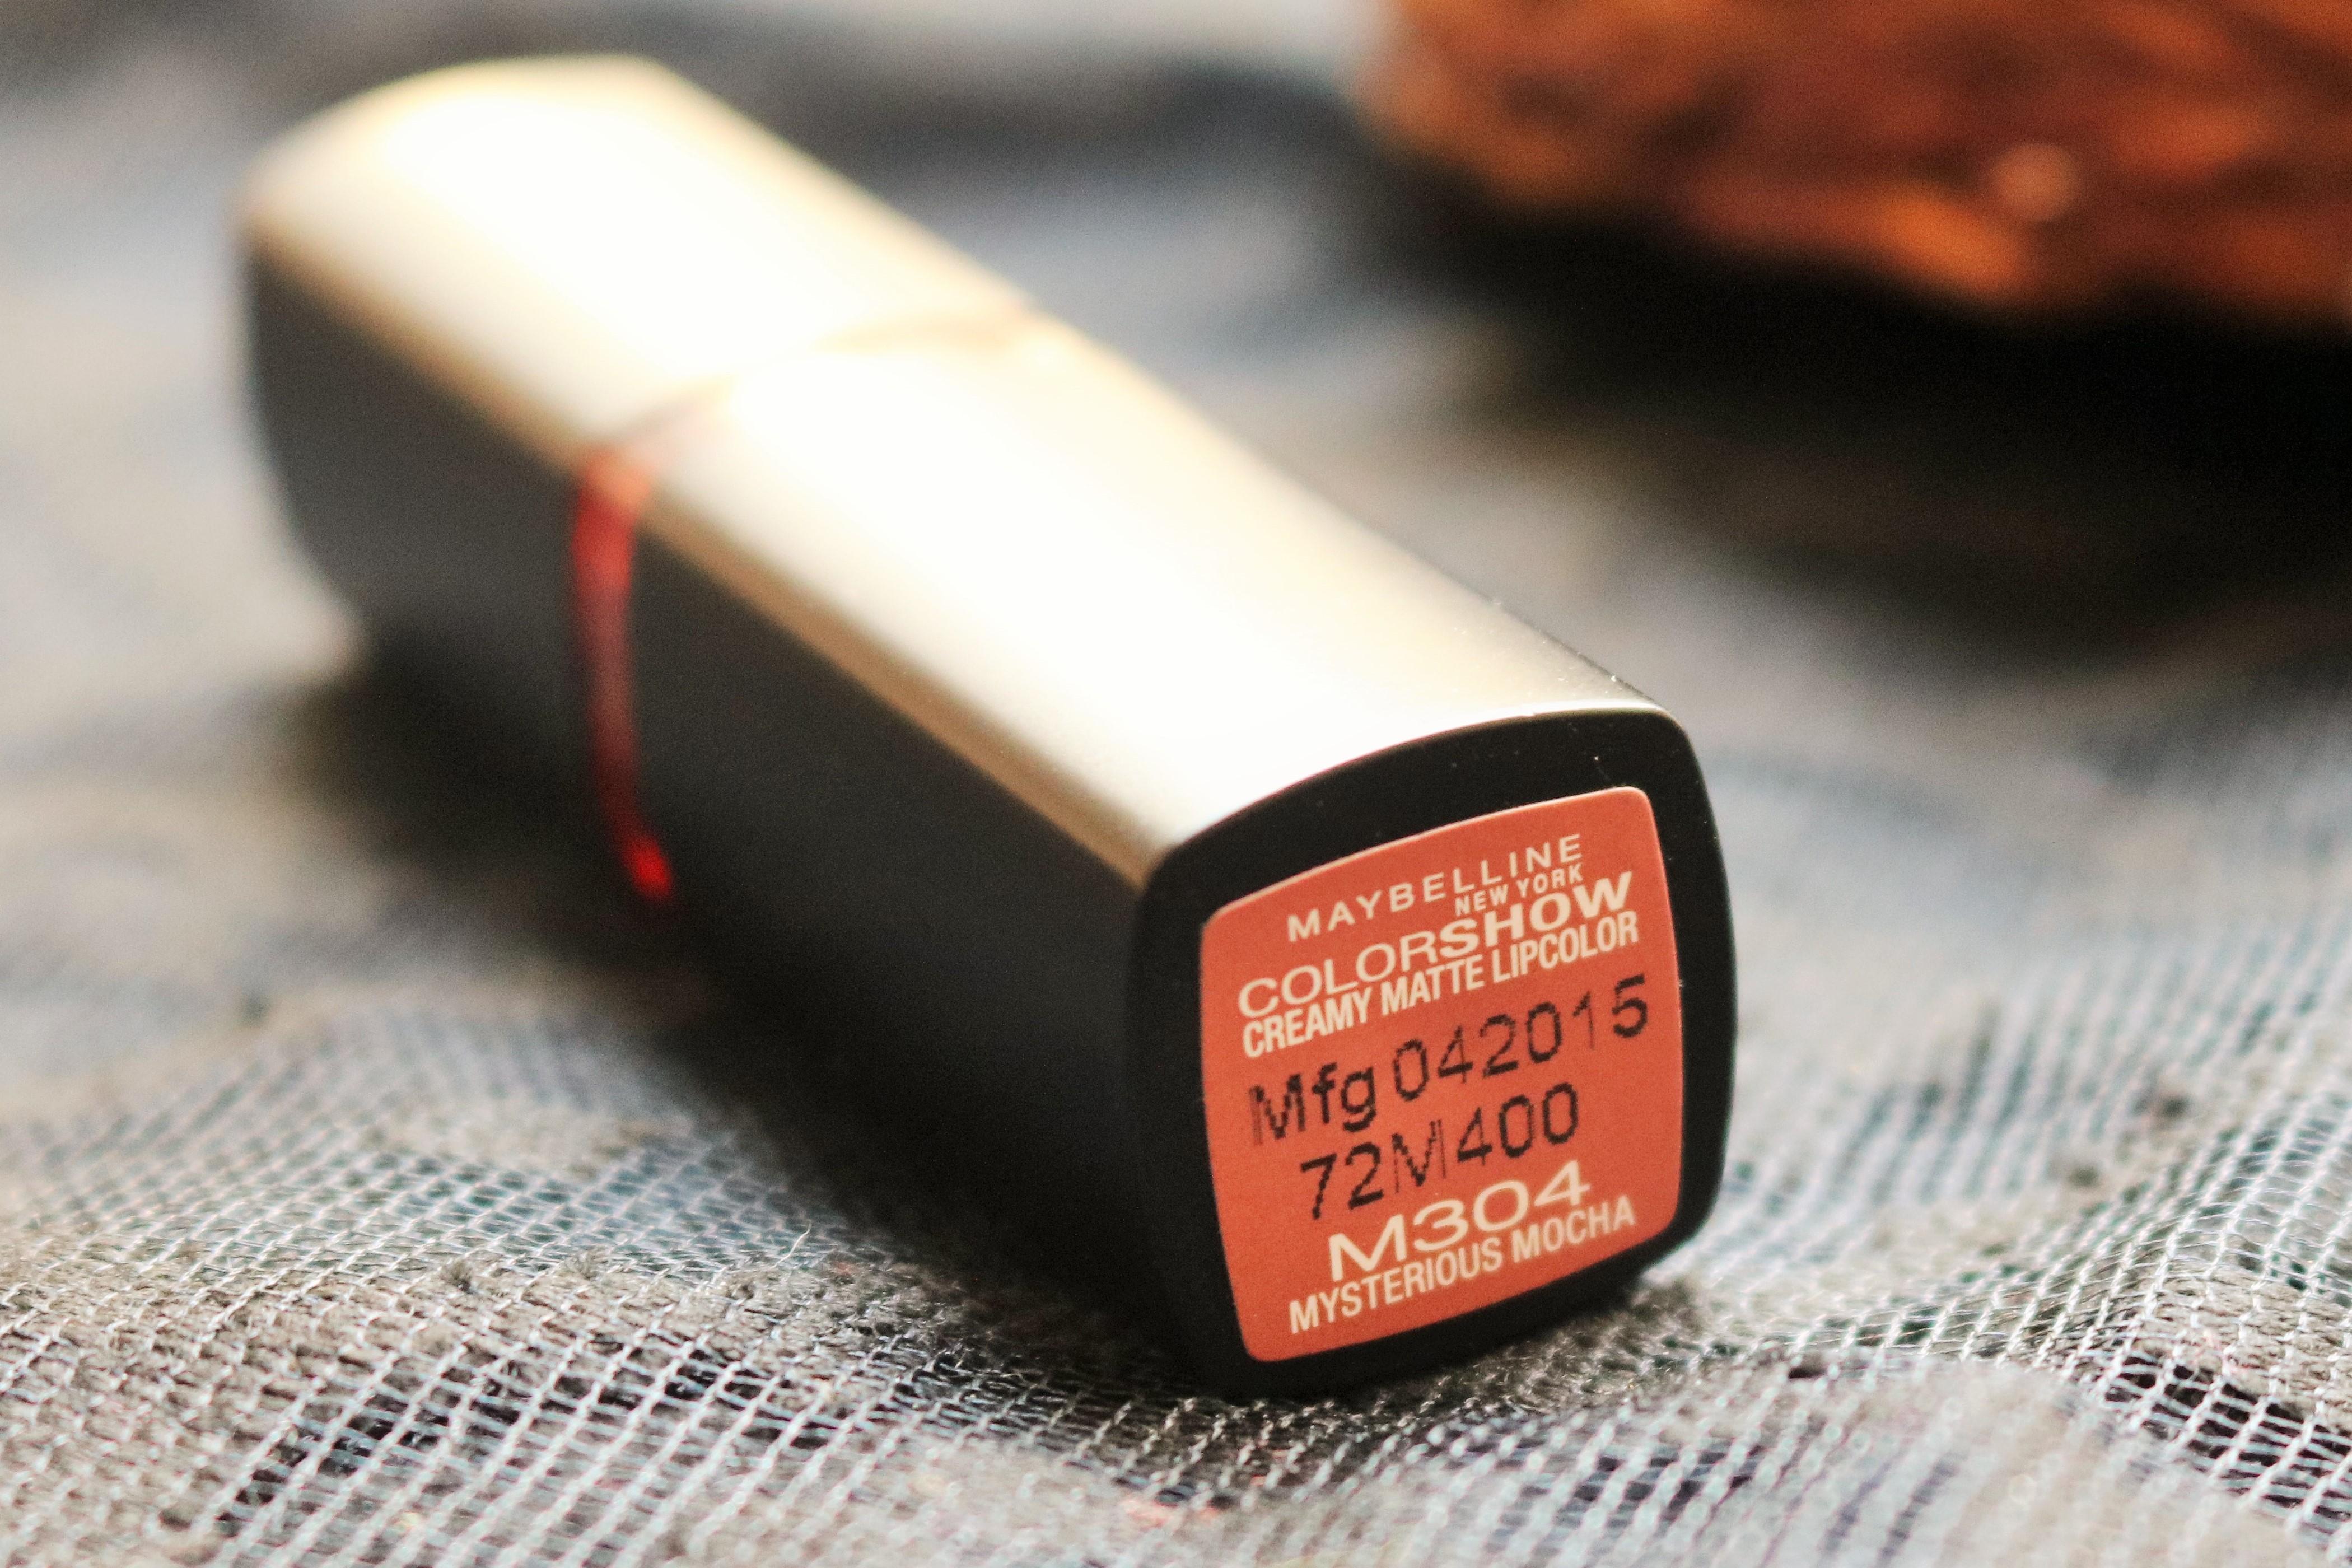 Maybelline Creamy Matte Lipstick Mysterious Mocha